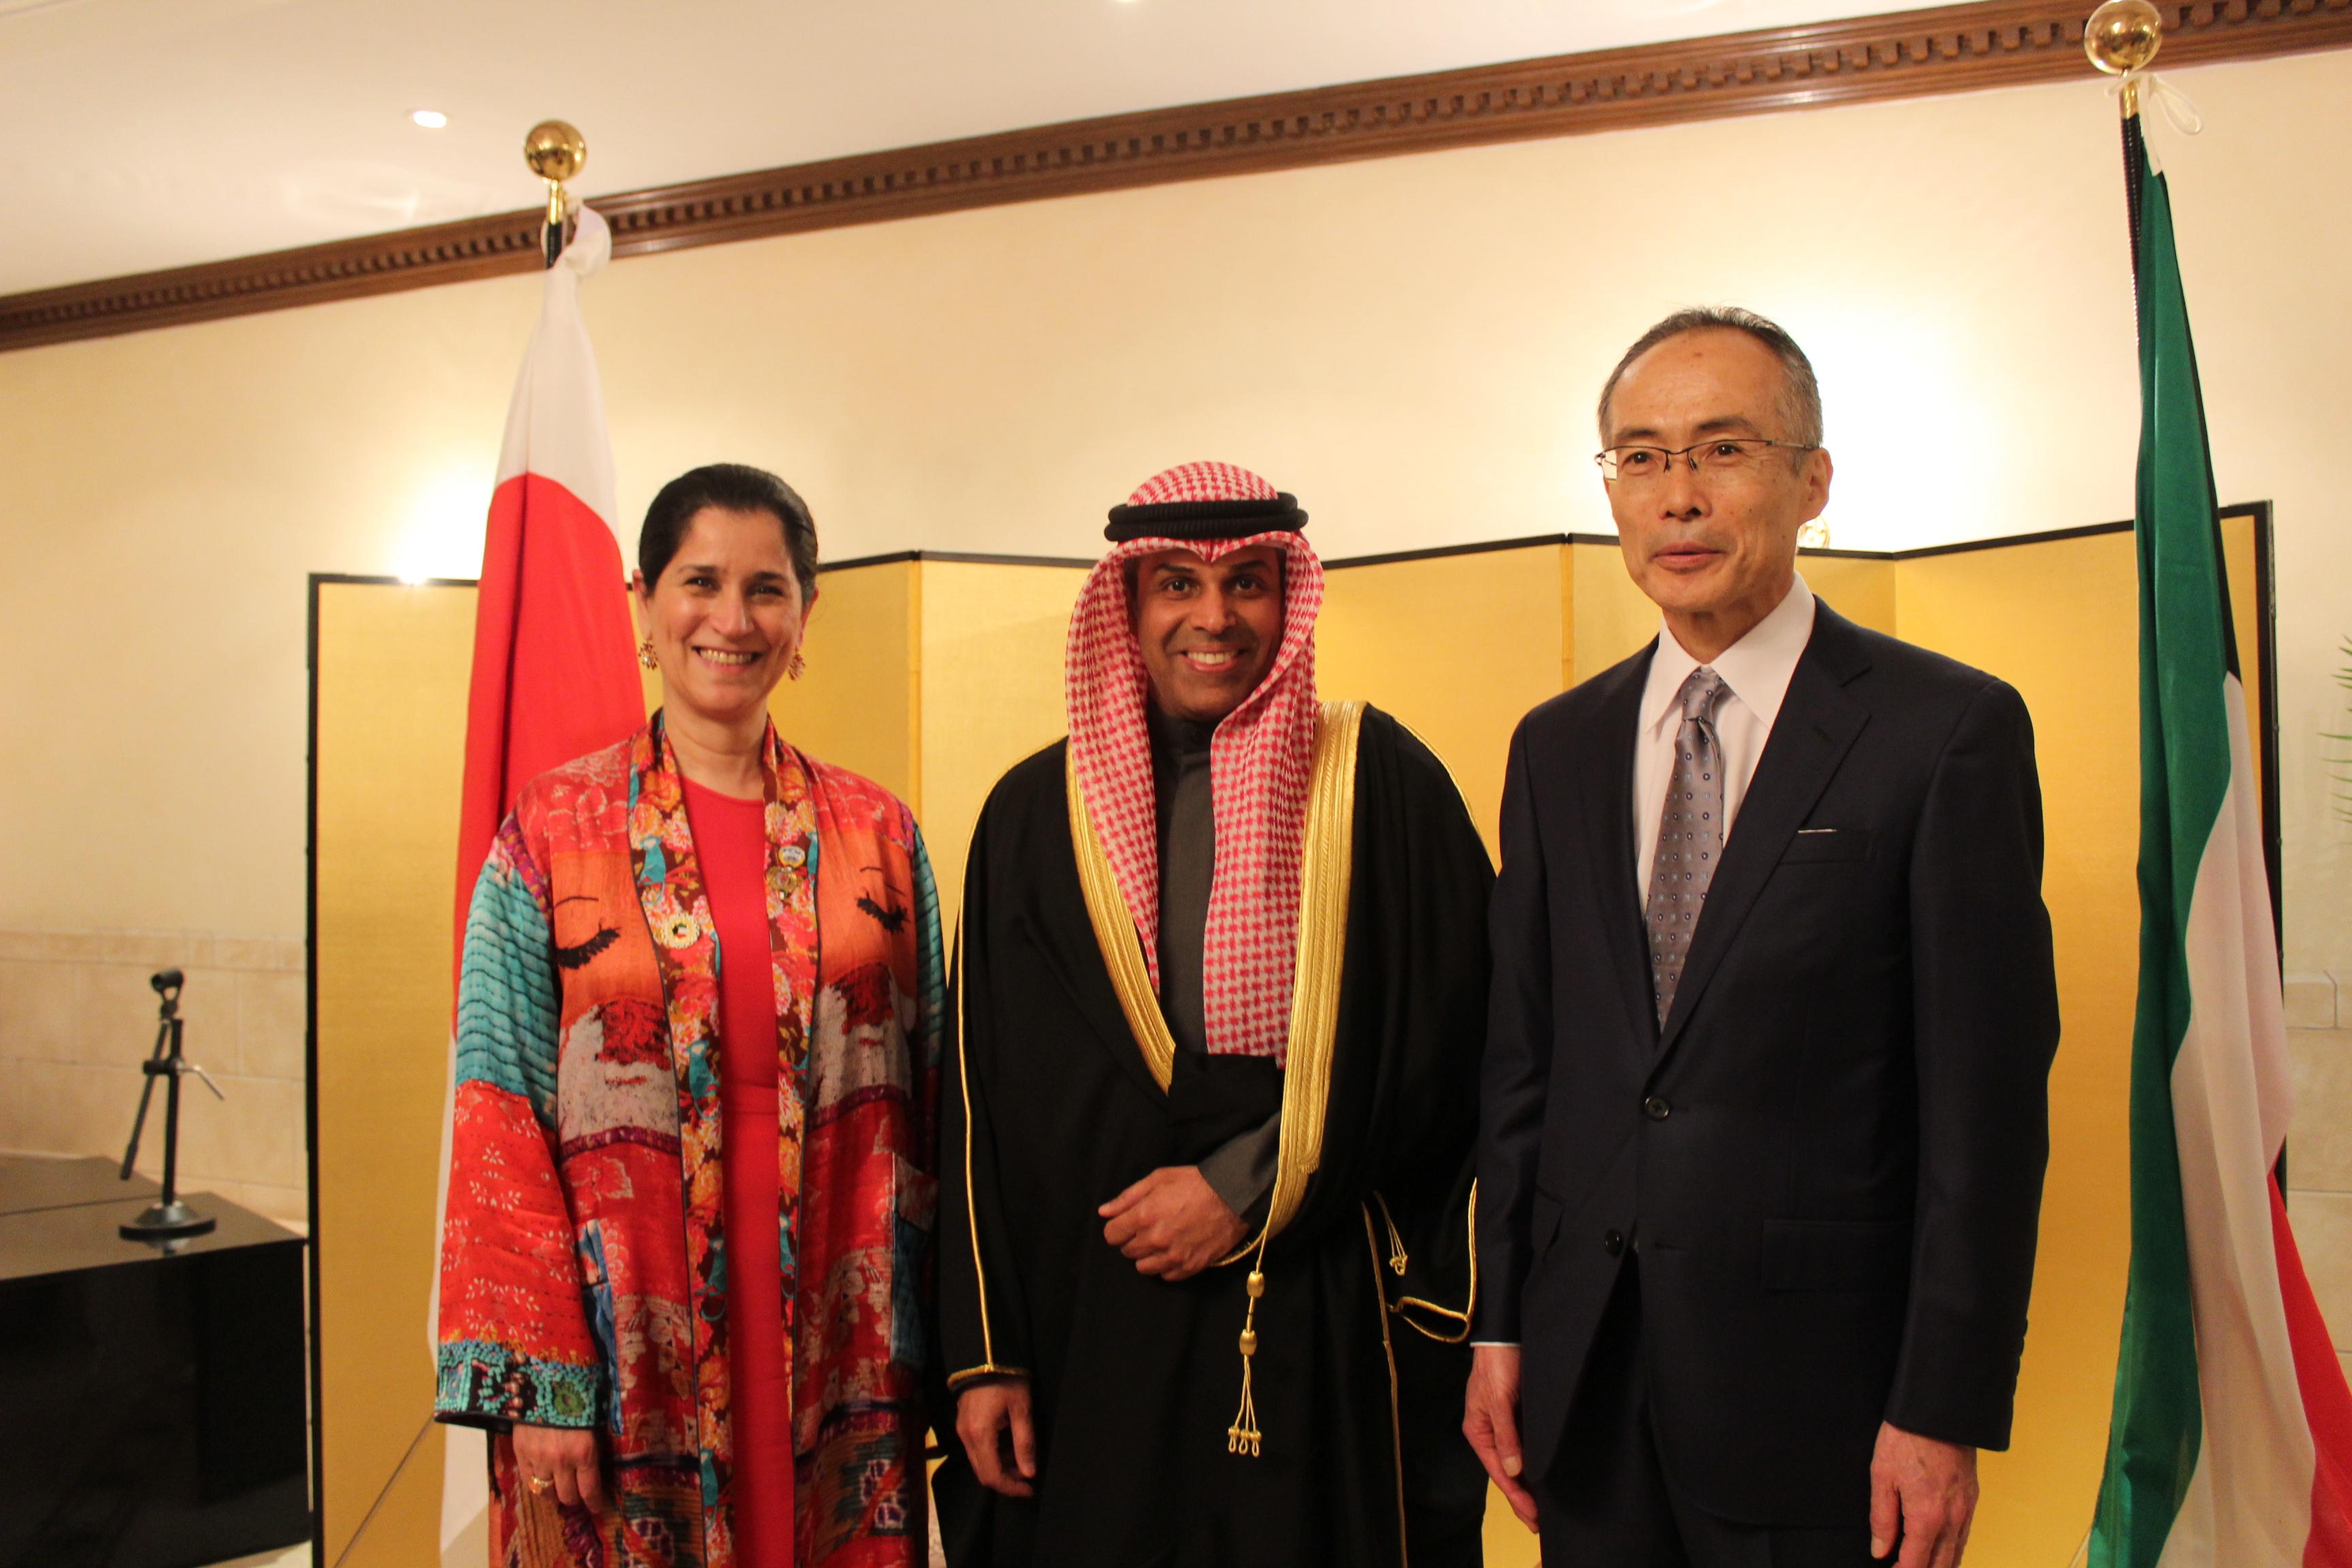 Embassy of Japan Kuwait